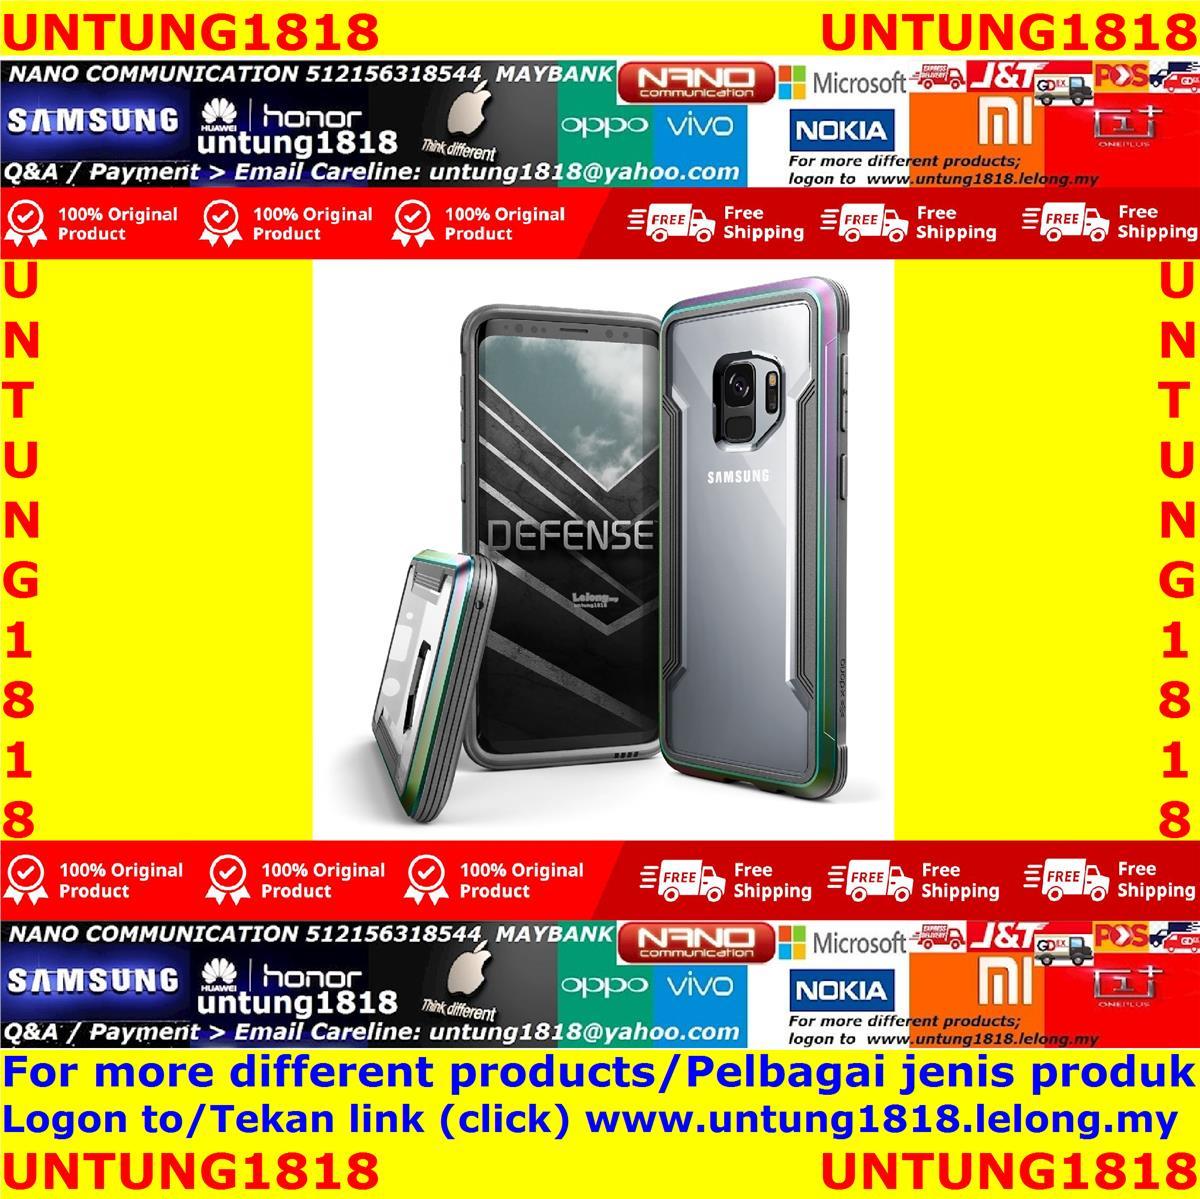 Samsung Galaxy S9 More Accessories Choice